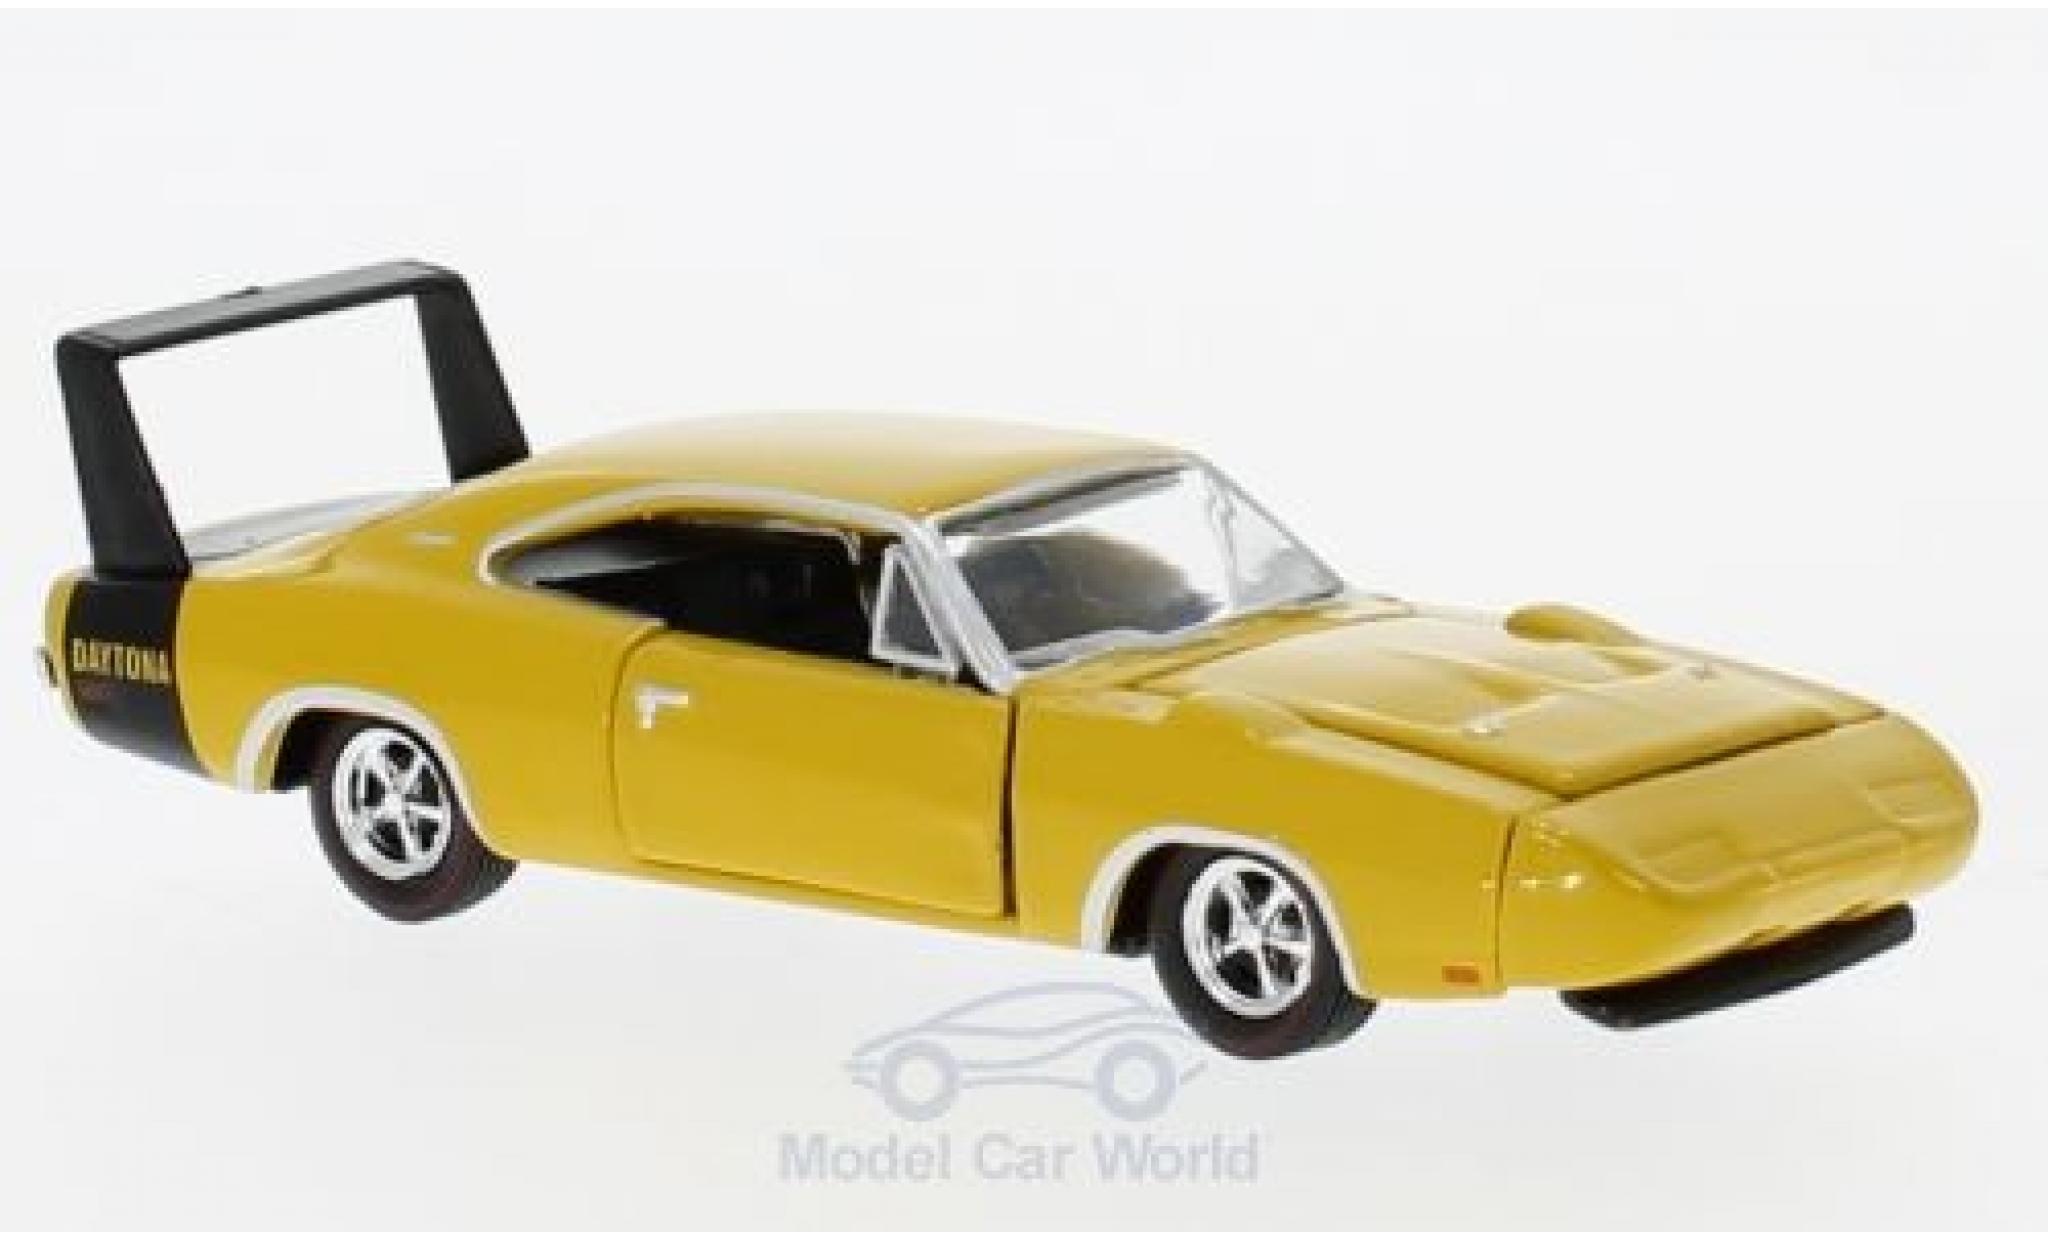 Dodge Charger Daytona 1/64 M2 Machines Daytona 440 yellow 1969